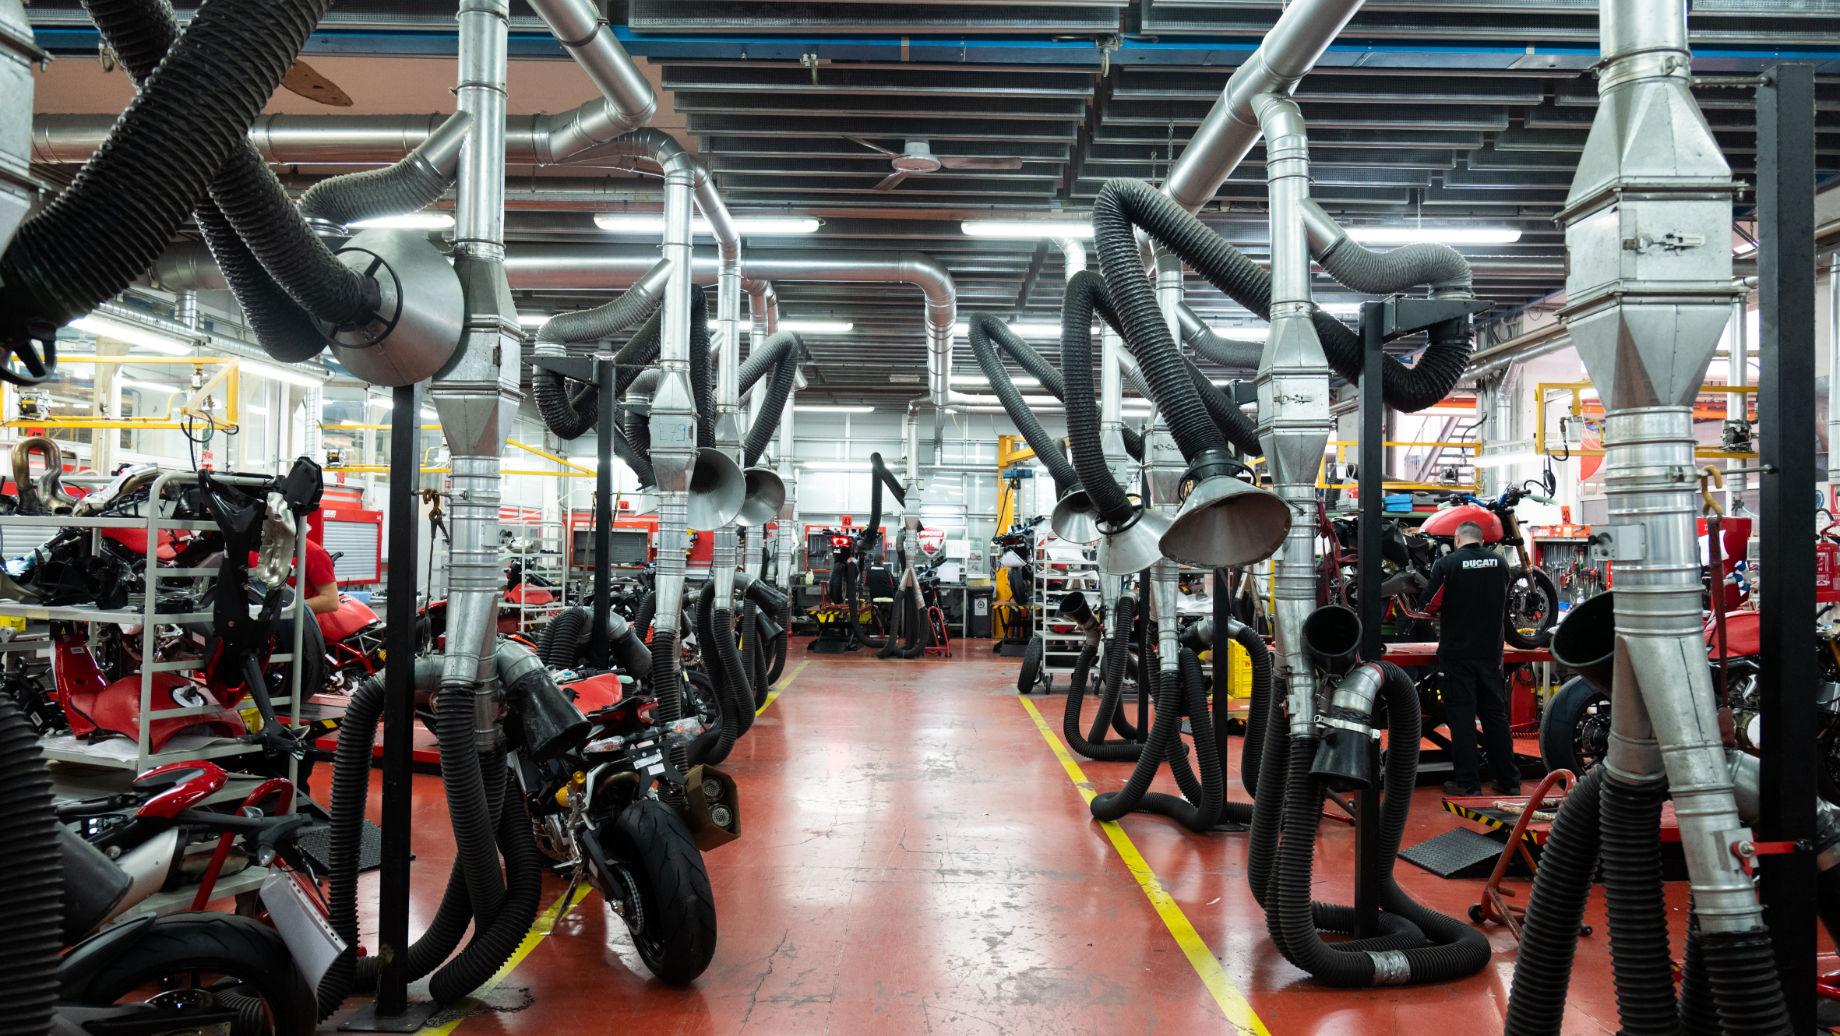 Ducati fatory - Assembly line